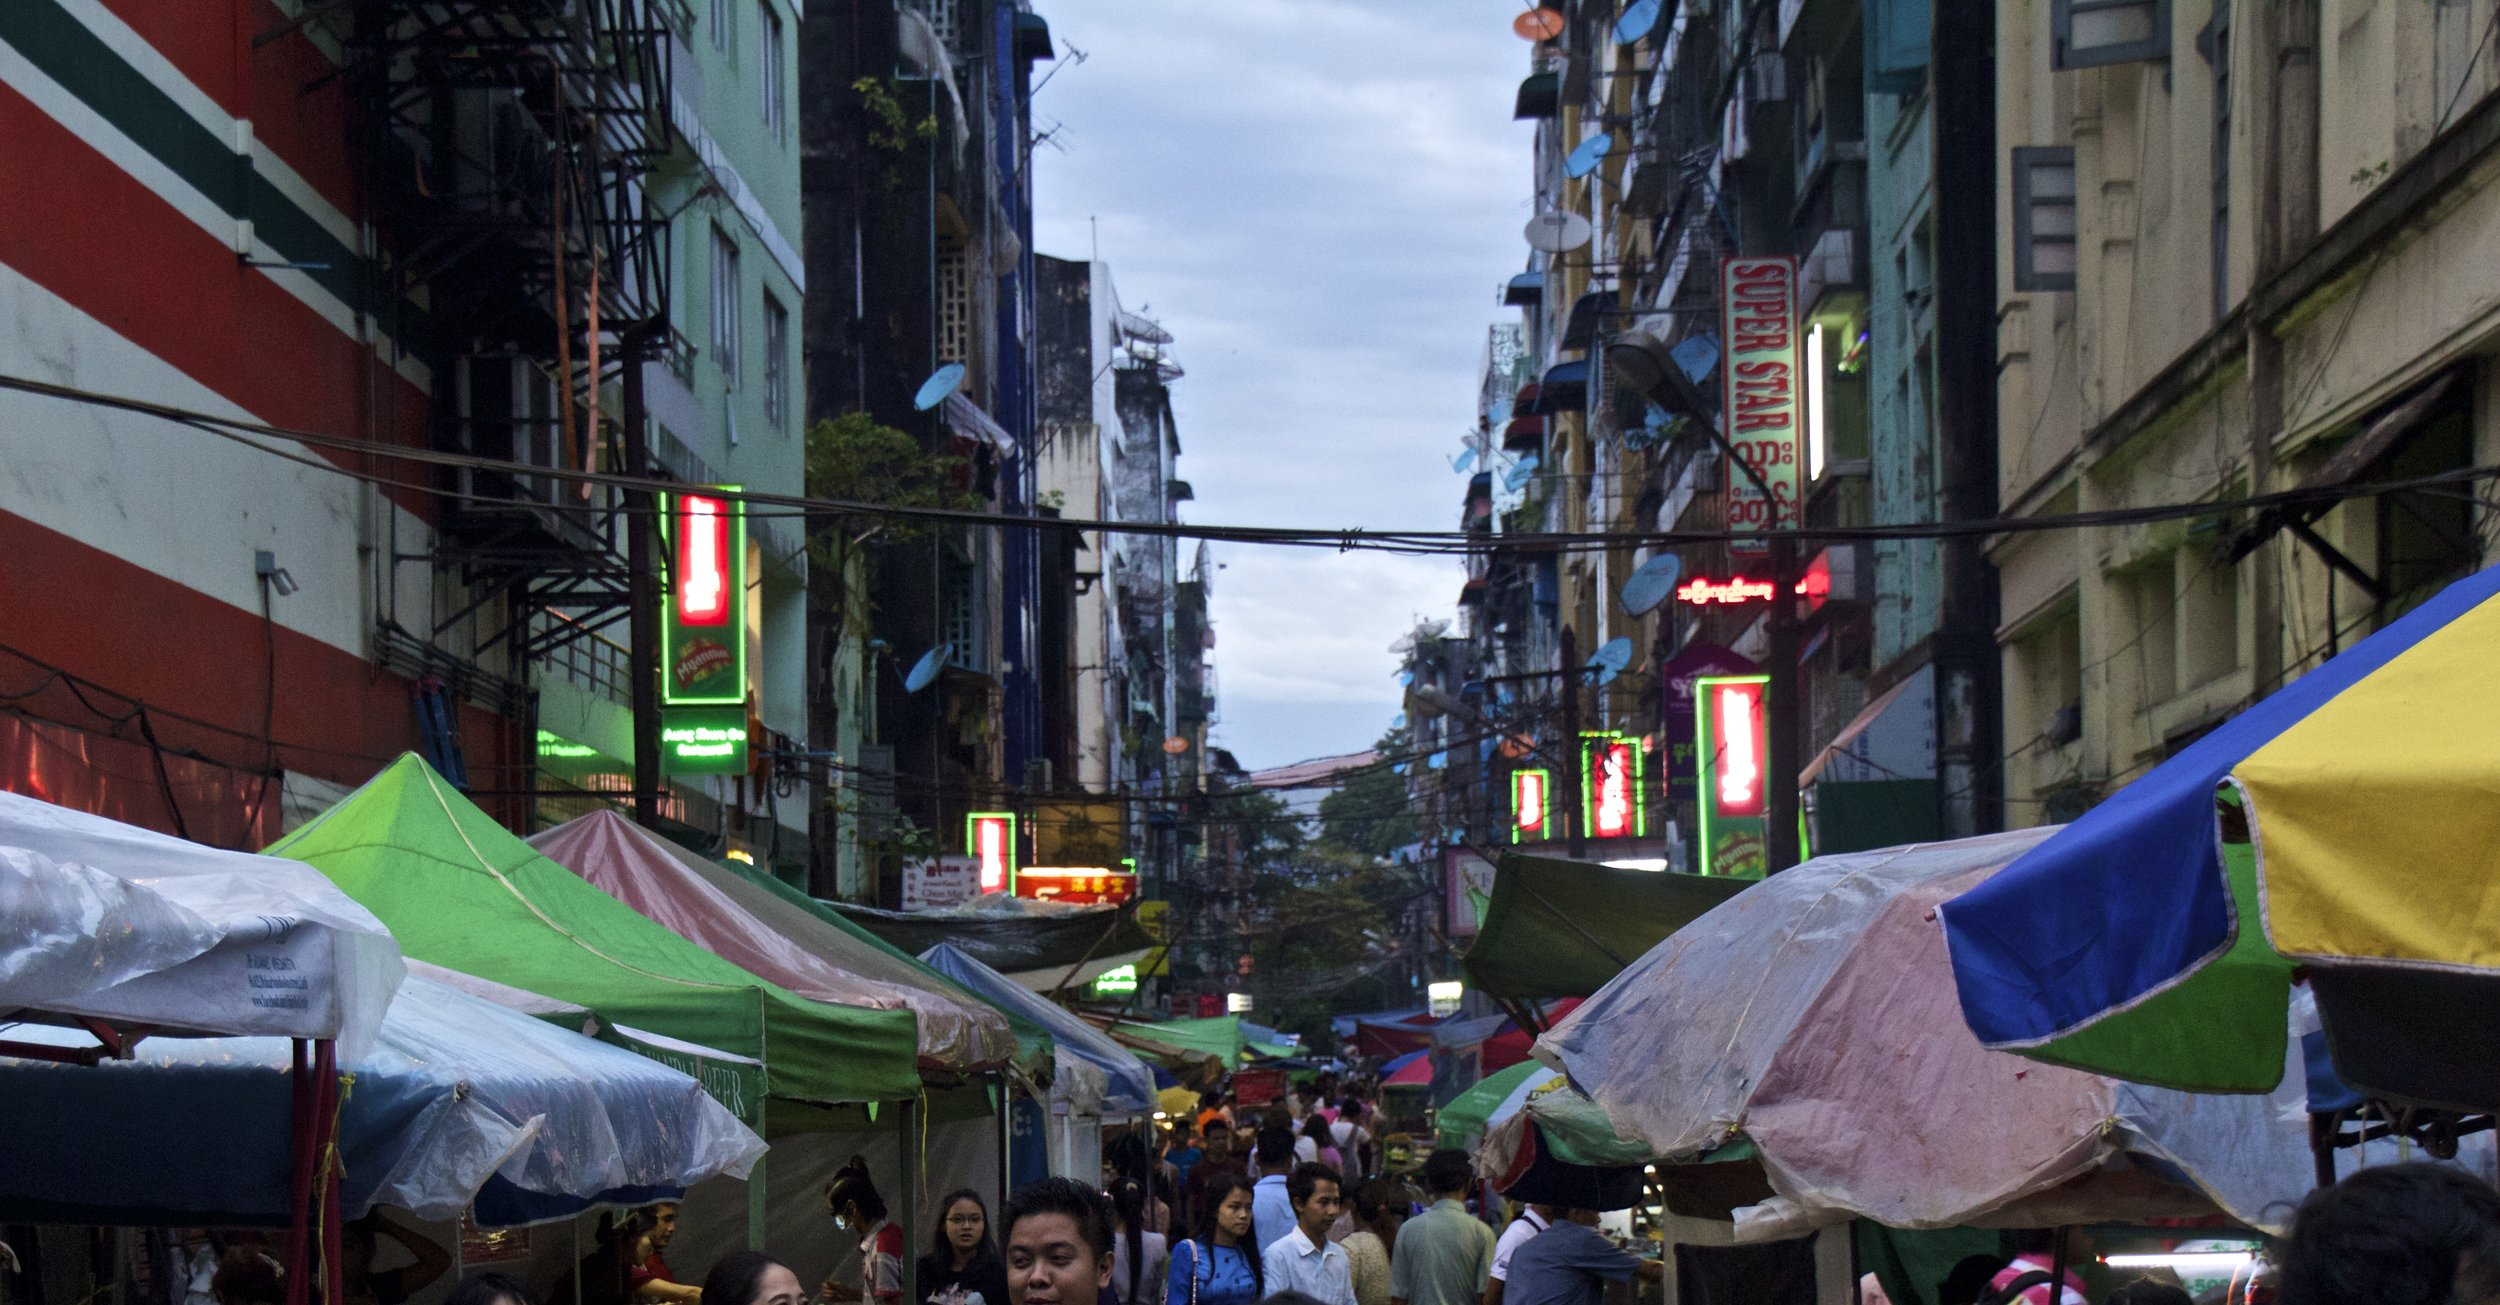 rangoon burma yangon myanmar 19.jpg